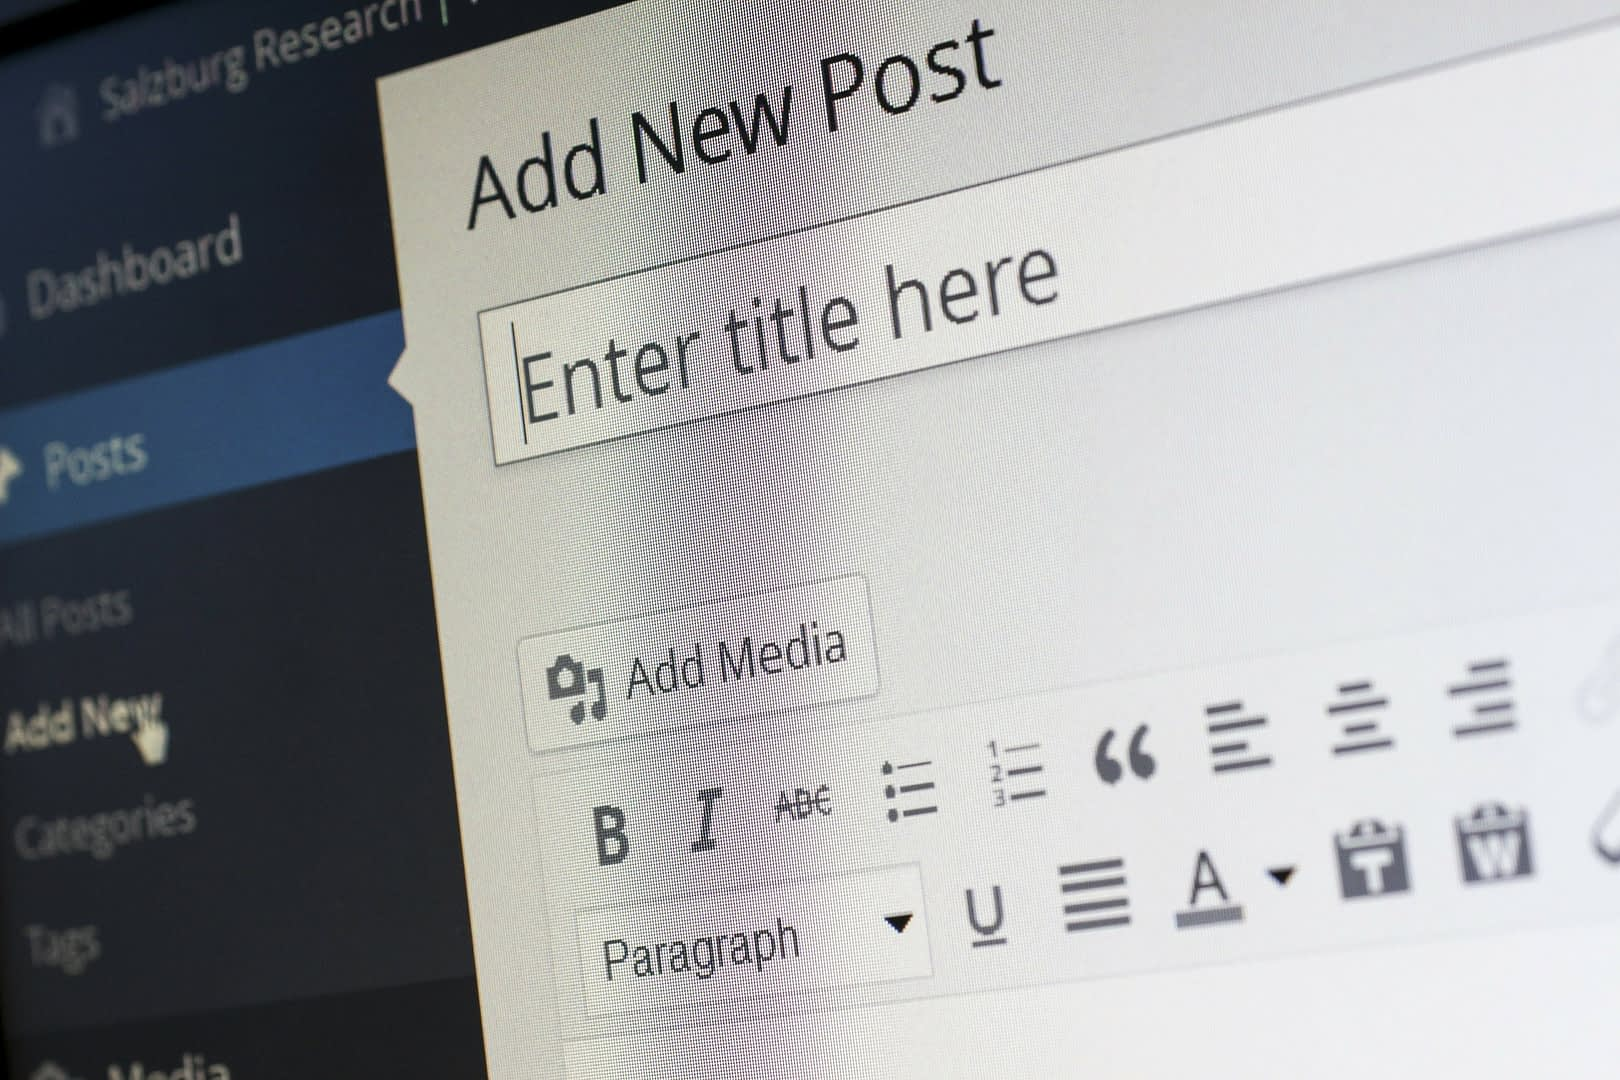 Blogging Outreach